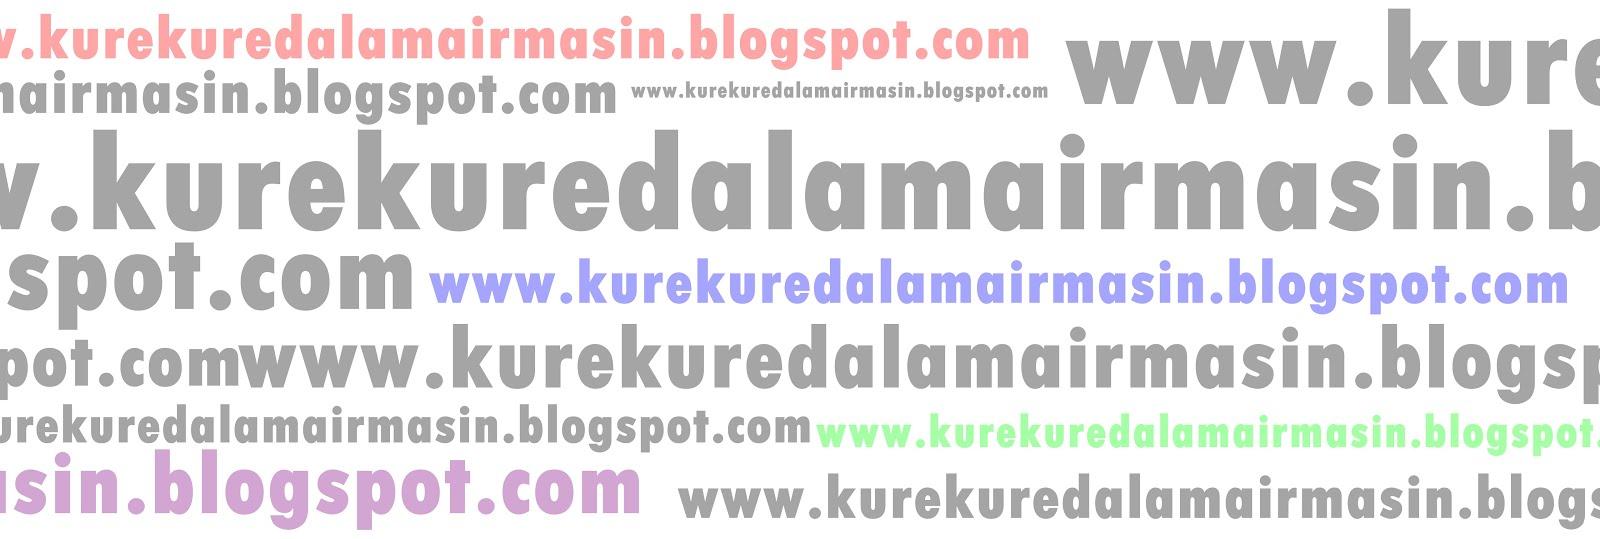 Blog Kure Kure